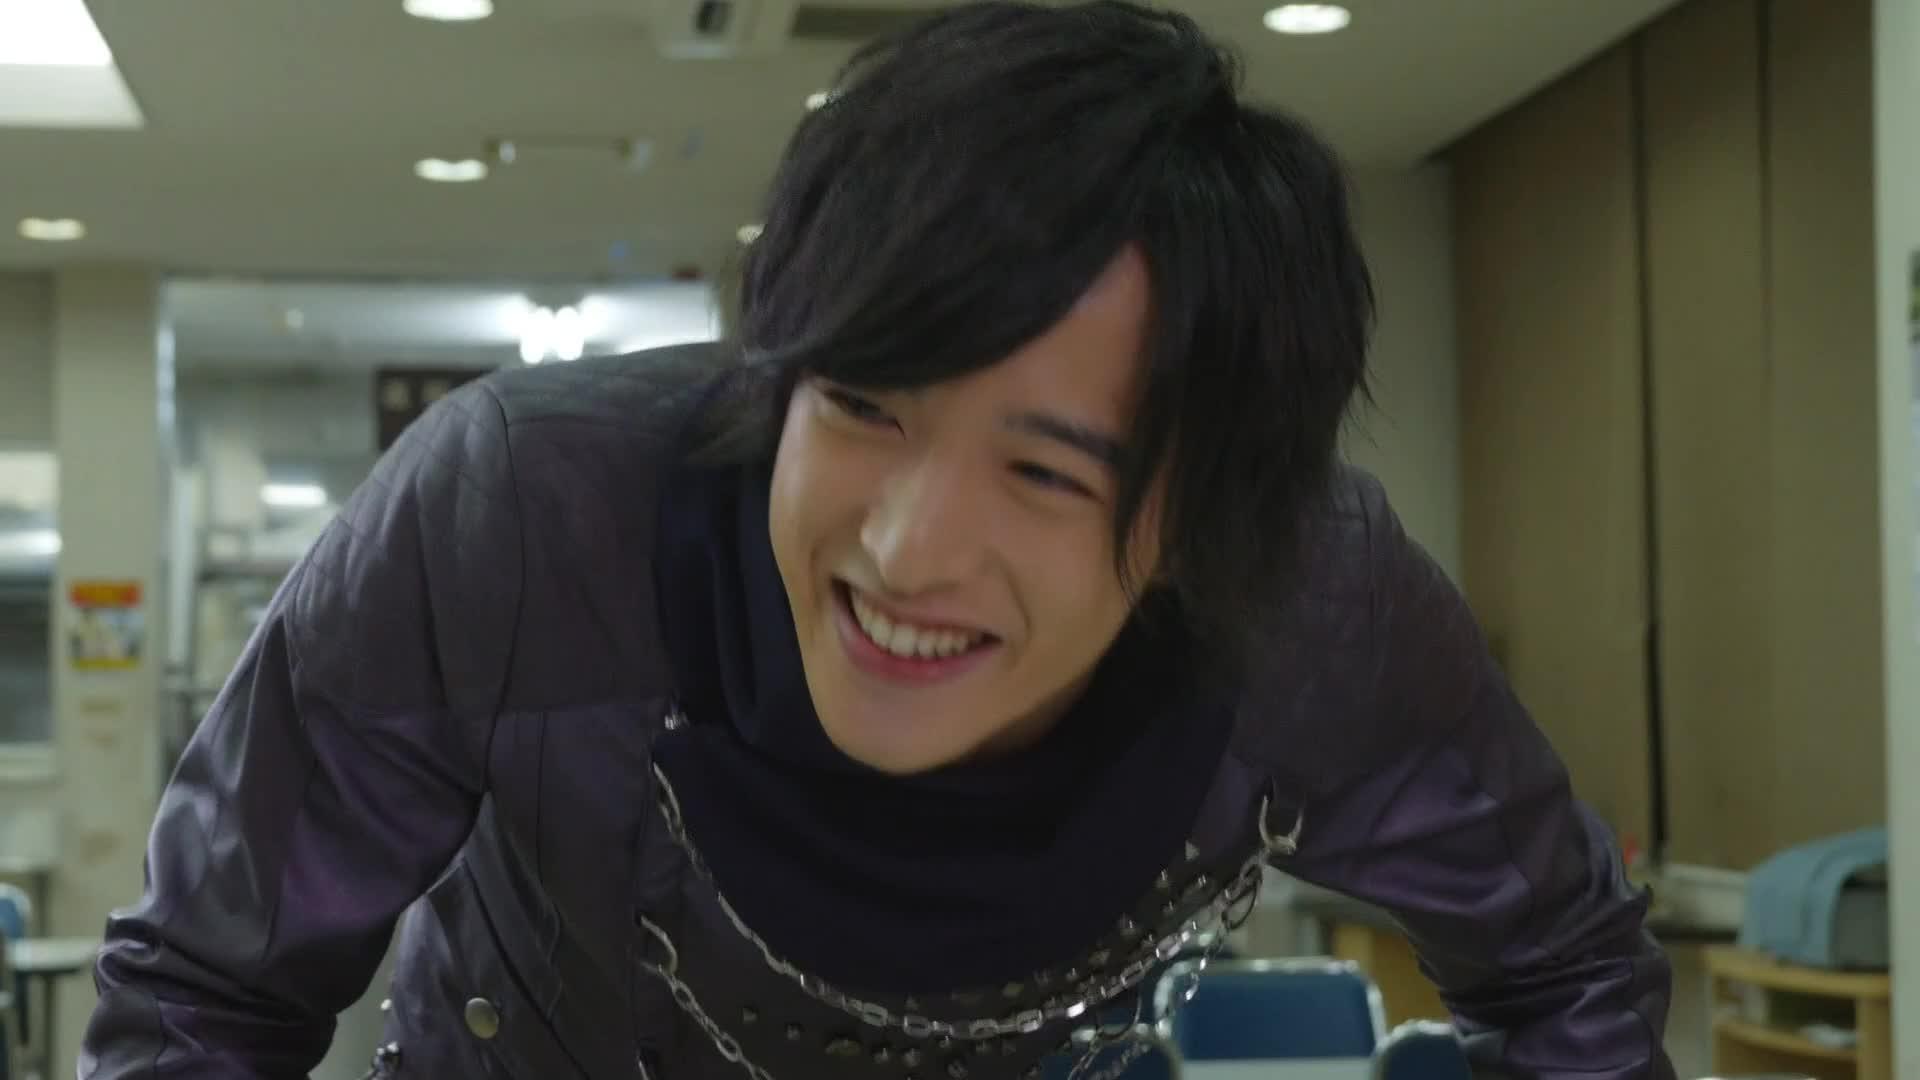 Chase, Chaser, Drive, Kamen Rider Drive, Mach, Toku, Tokusatsu, Smile GIFs